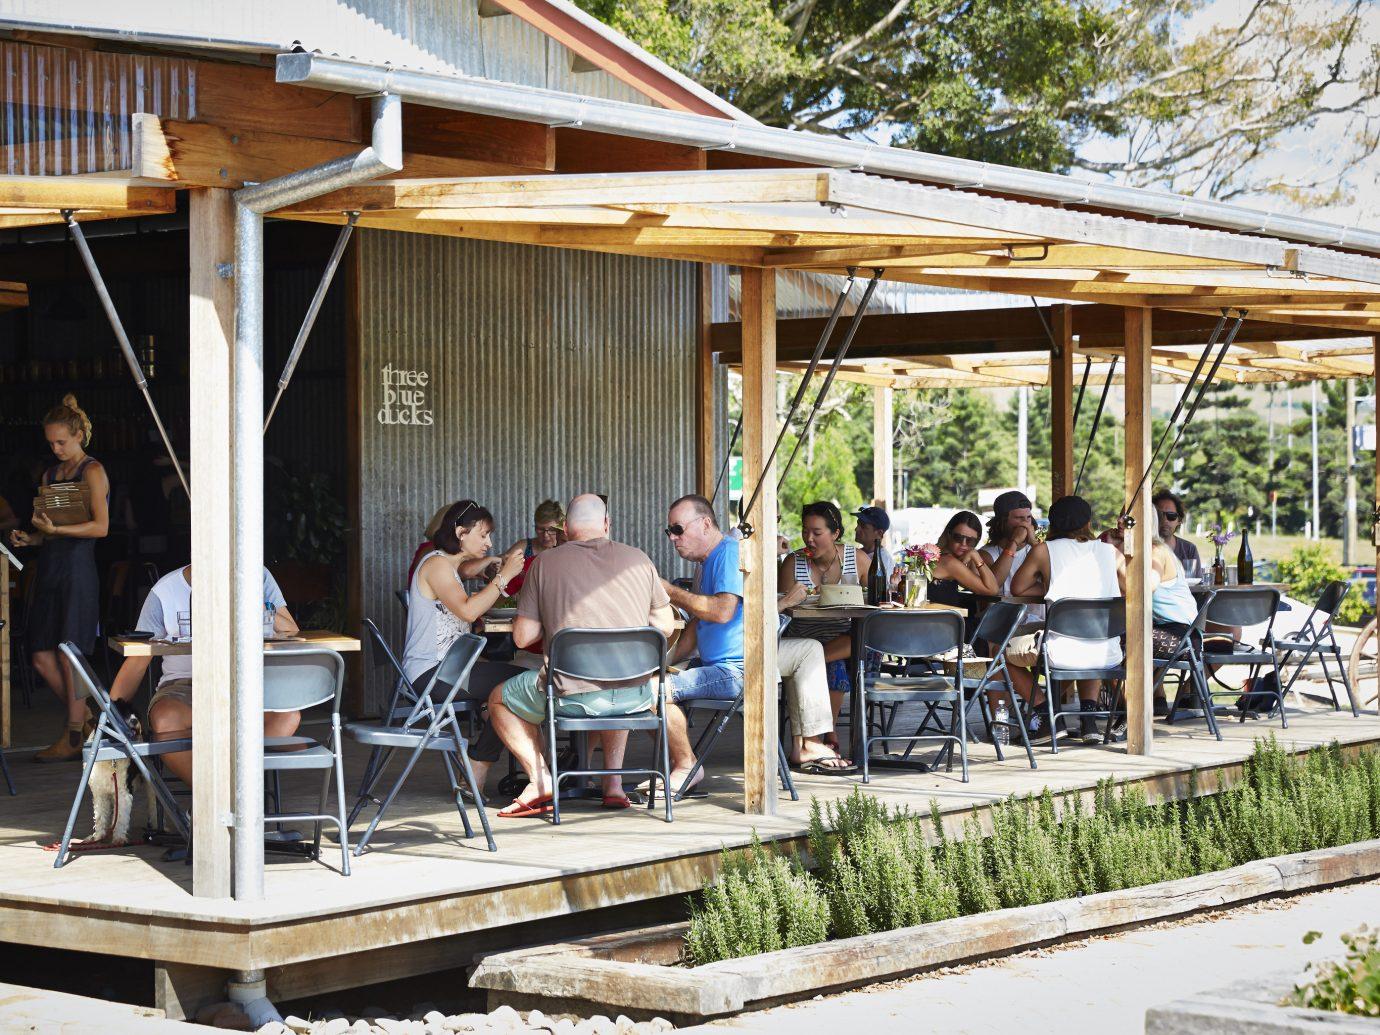 Beach Trip Ideas outdoor leisure building outdoor structure Deck